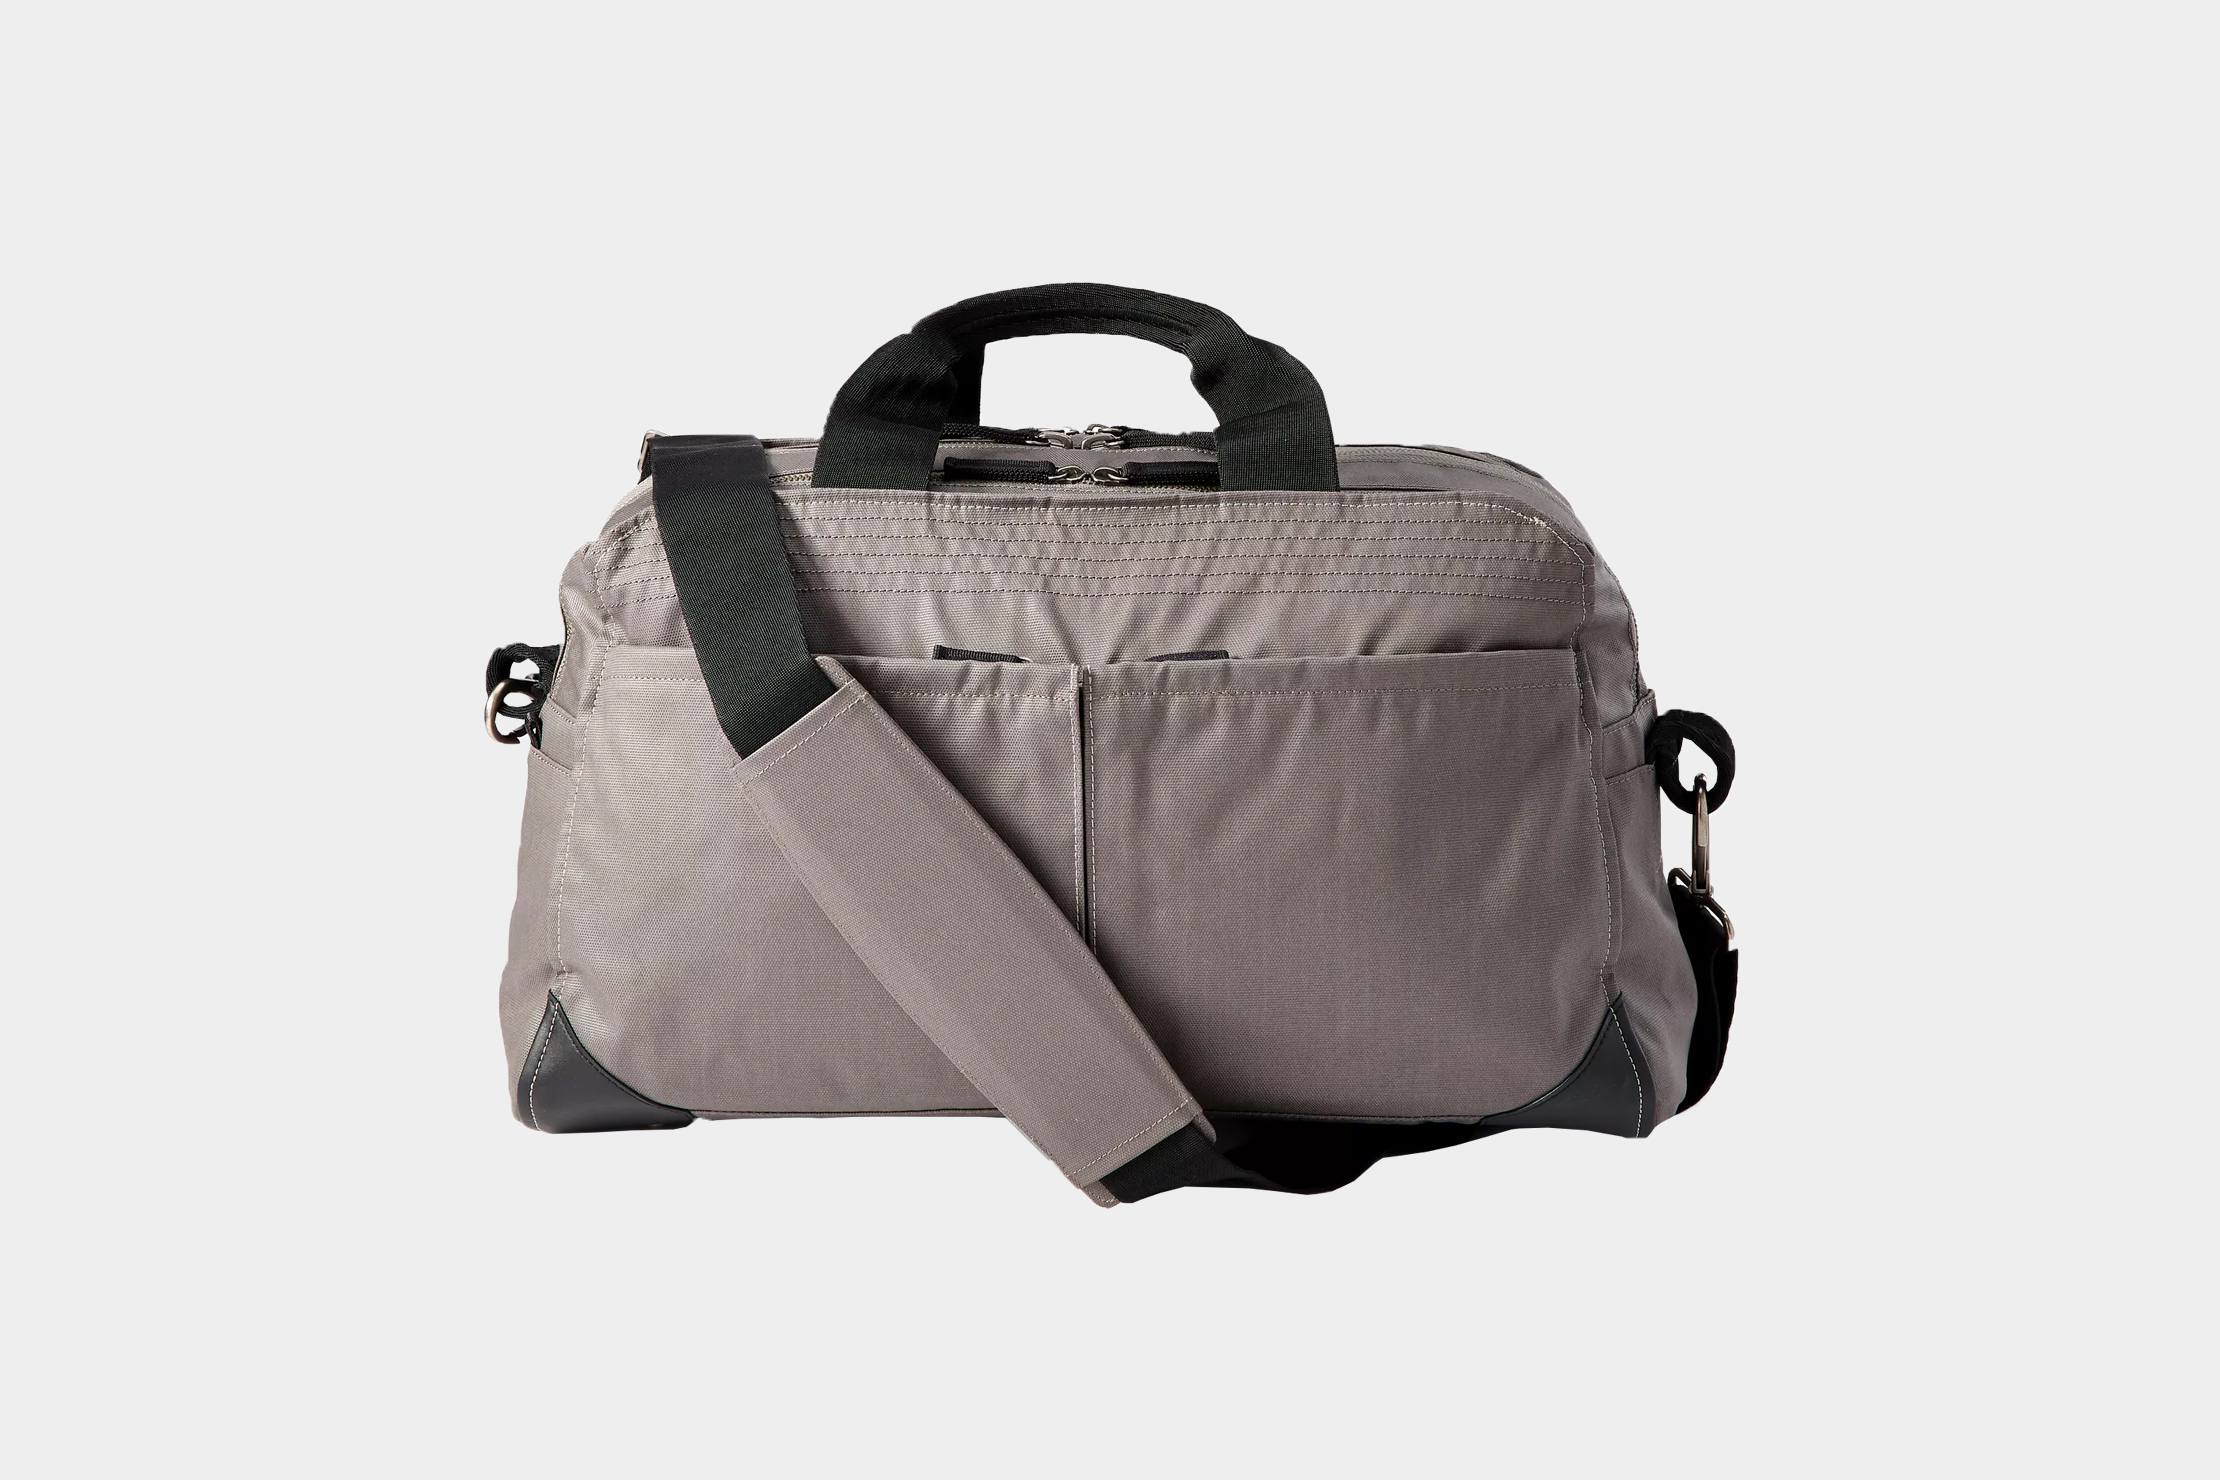 df351c1b1 Pakt One 35L Duffel Travel Bag Review | Pack Hacker